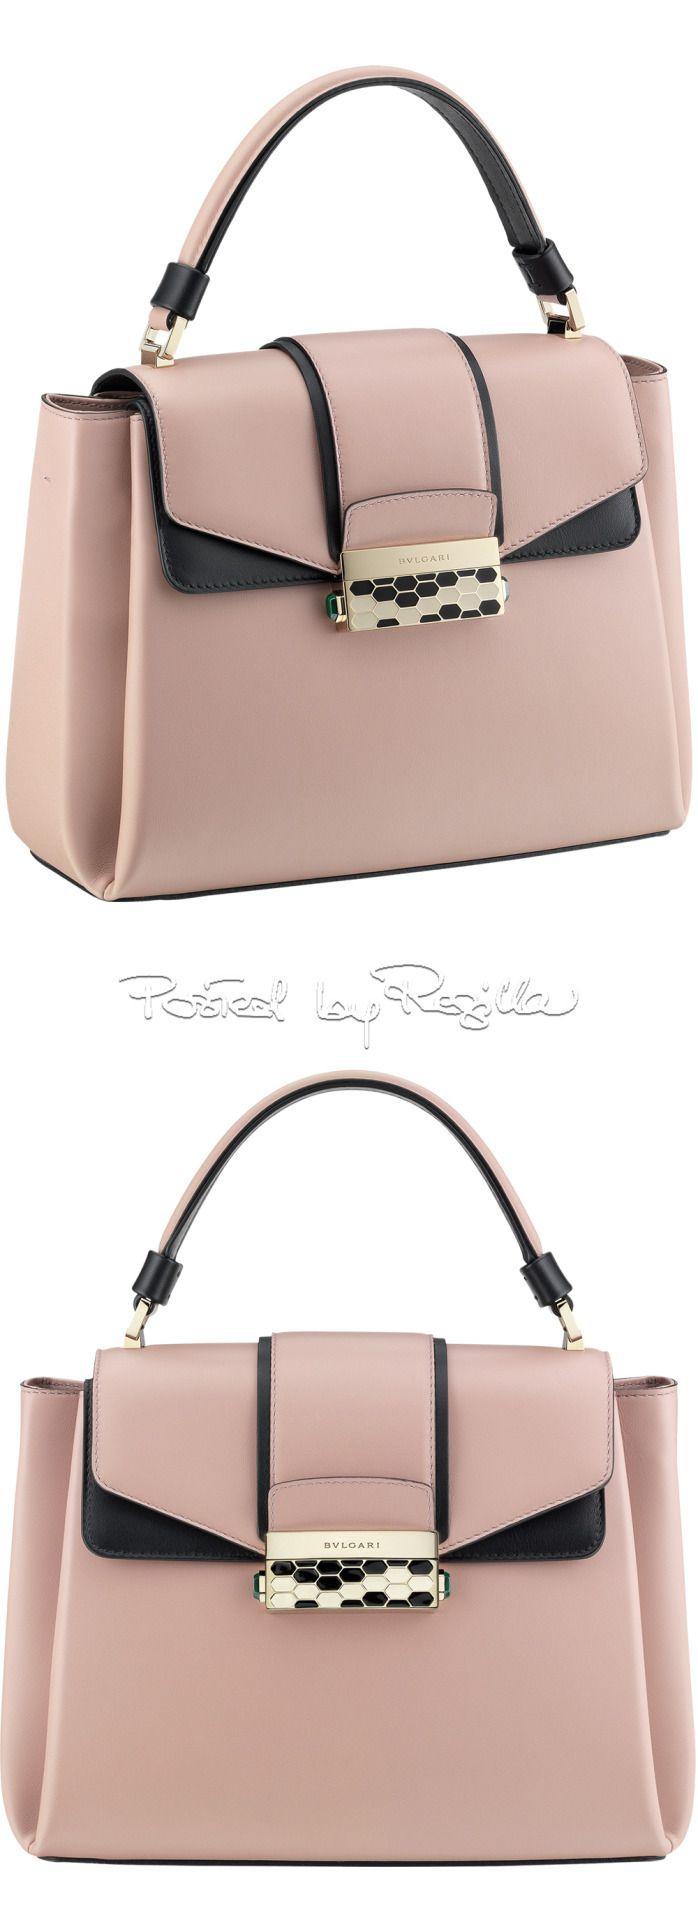 Regilla ⚜ Bulgari, Roma Buy Women fashion wallets and Latest Hand Bags USA at fashion Cornerstone.